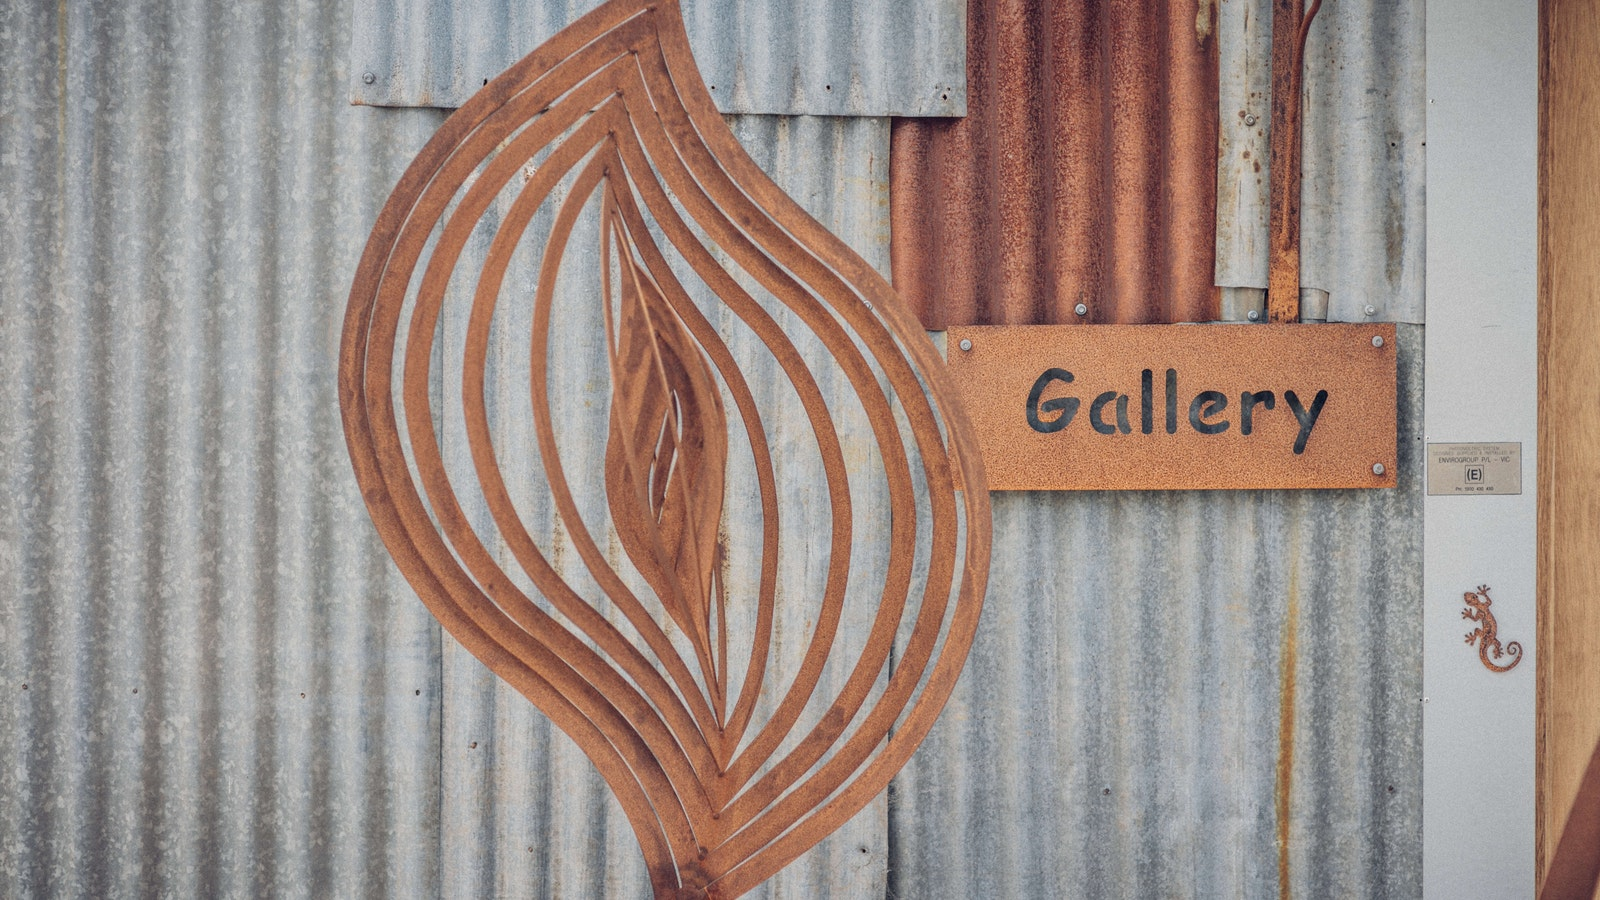 Overwrought Sculpture Garden and Gallery